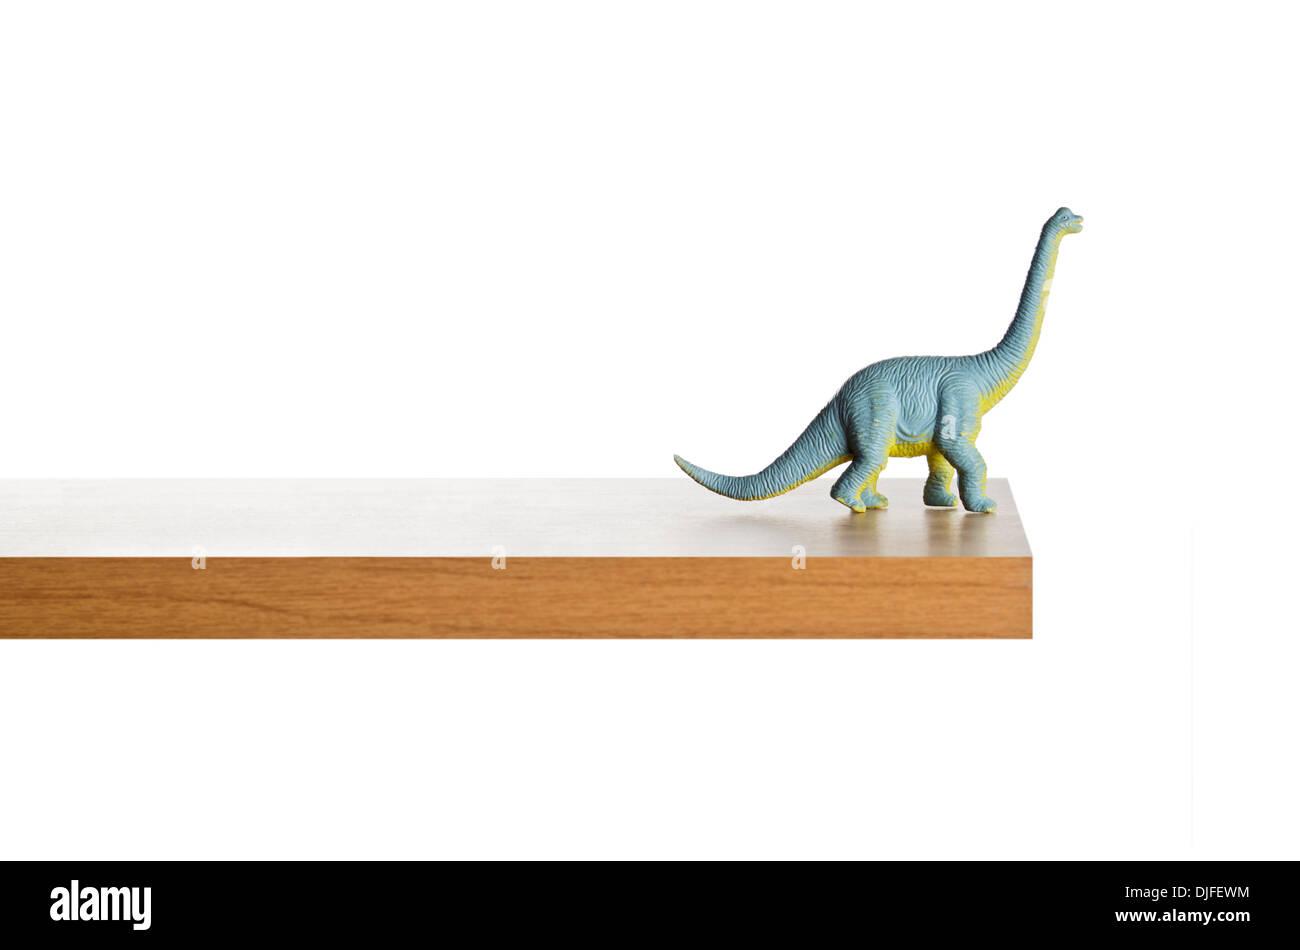 Dinosaur figurine placed on a ledge - Stock Image